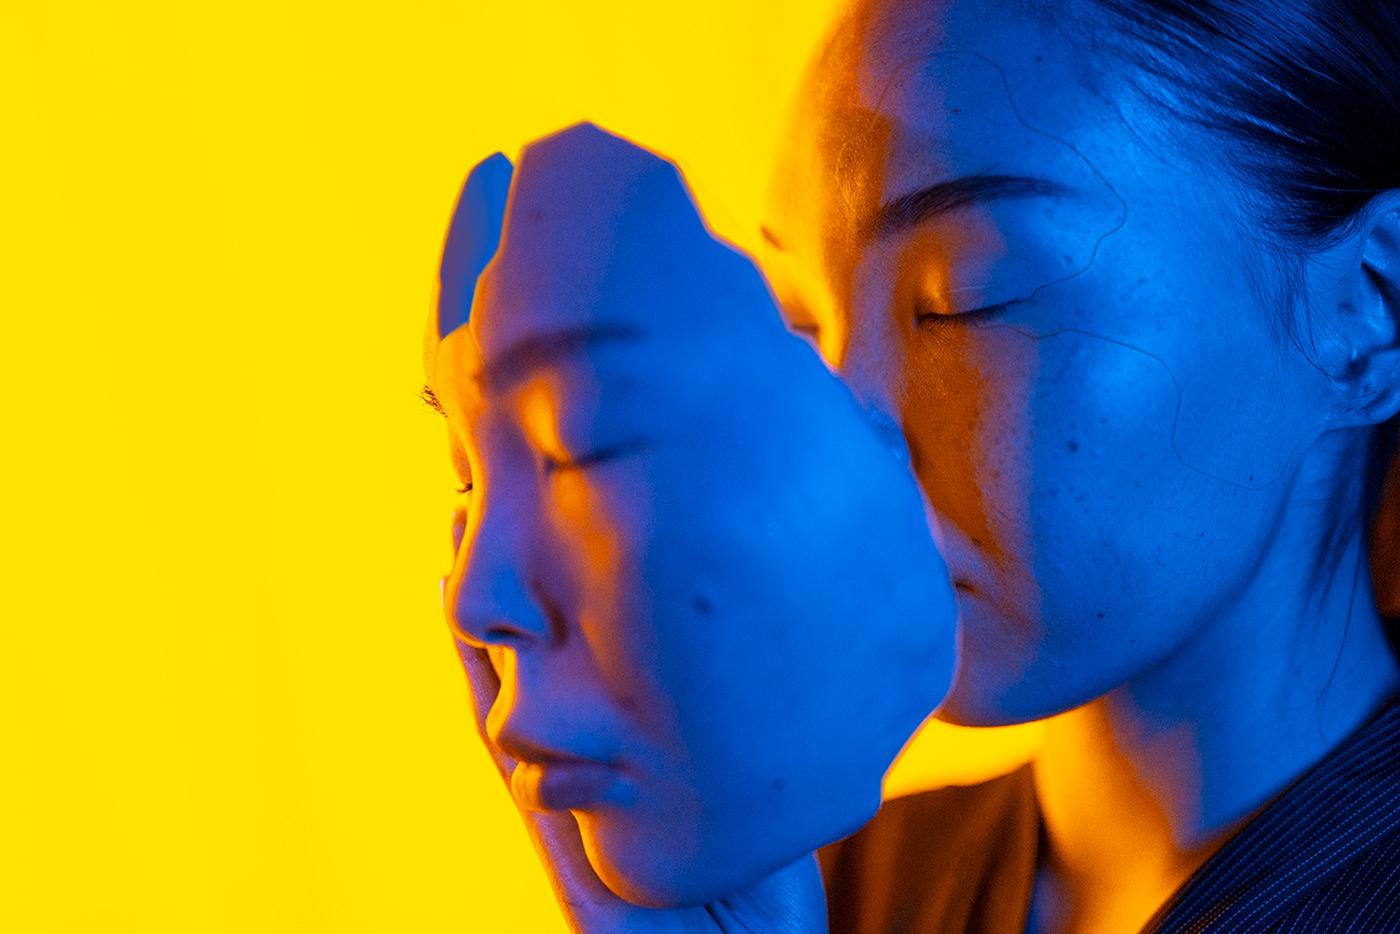 crypto Cyberpunk digital future mutant neon race reality Technology virtual